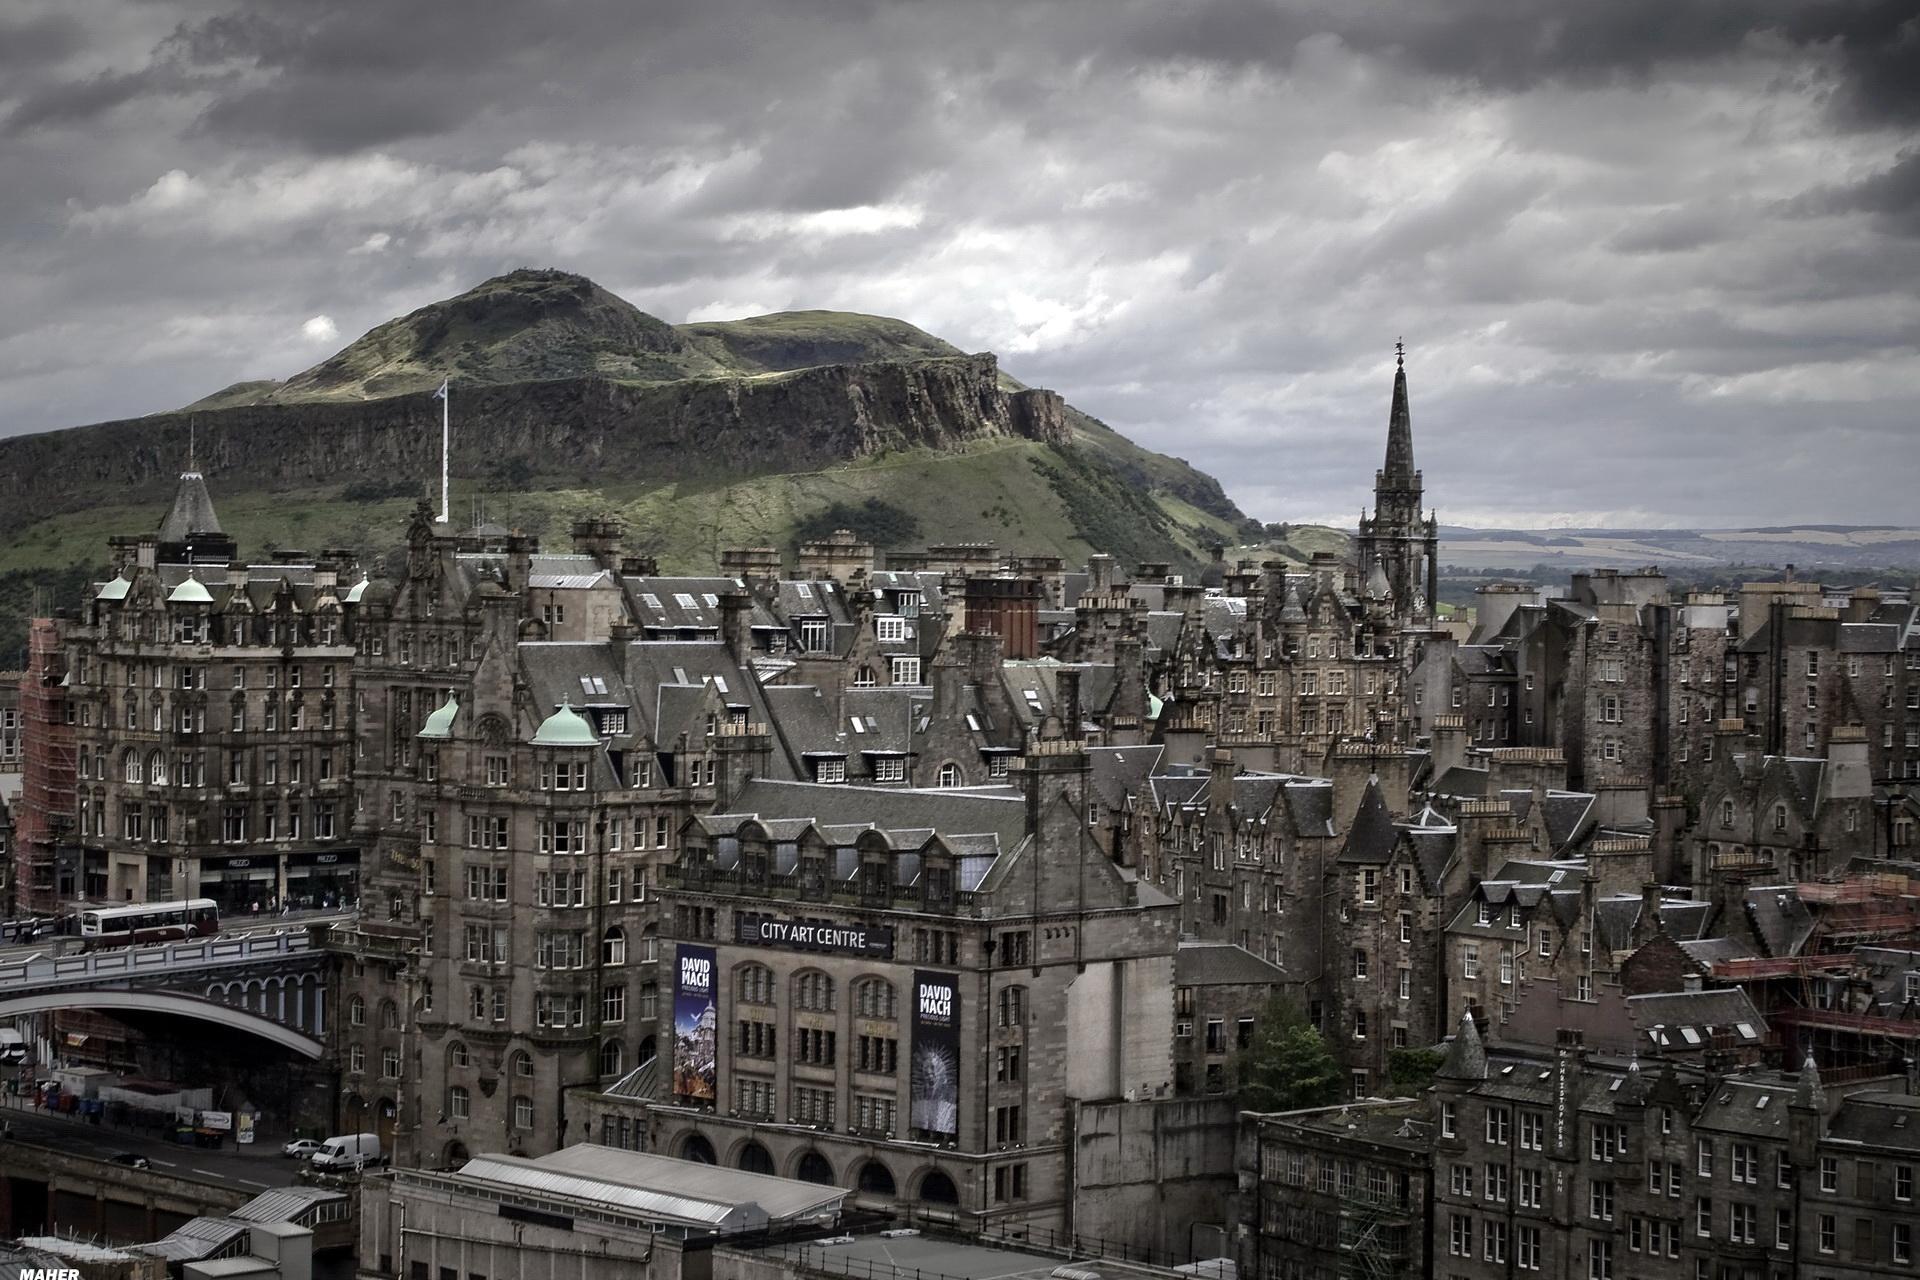 edinburgh scotland wallpaper - photo #13